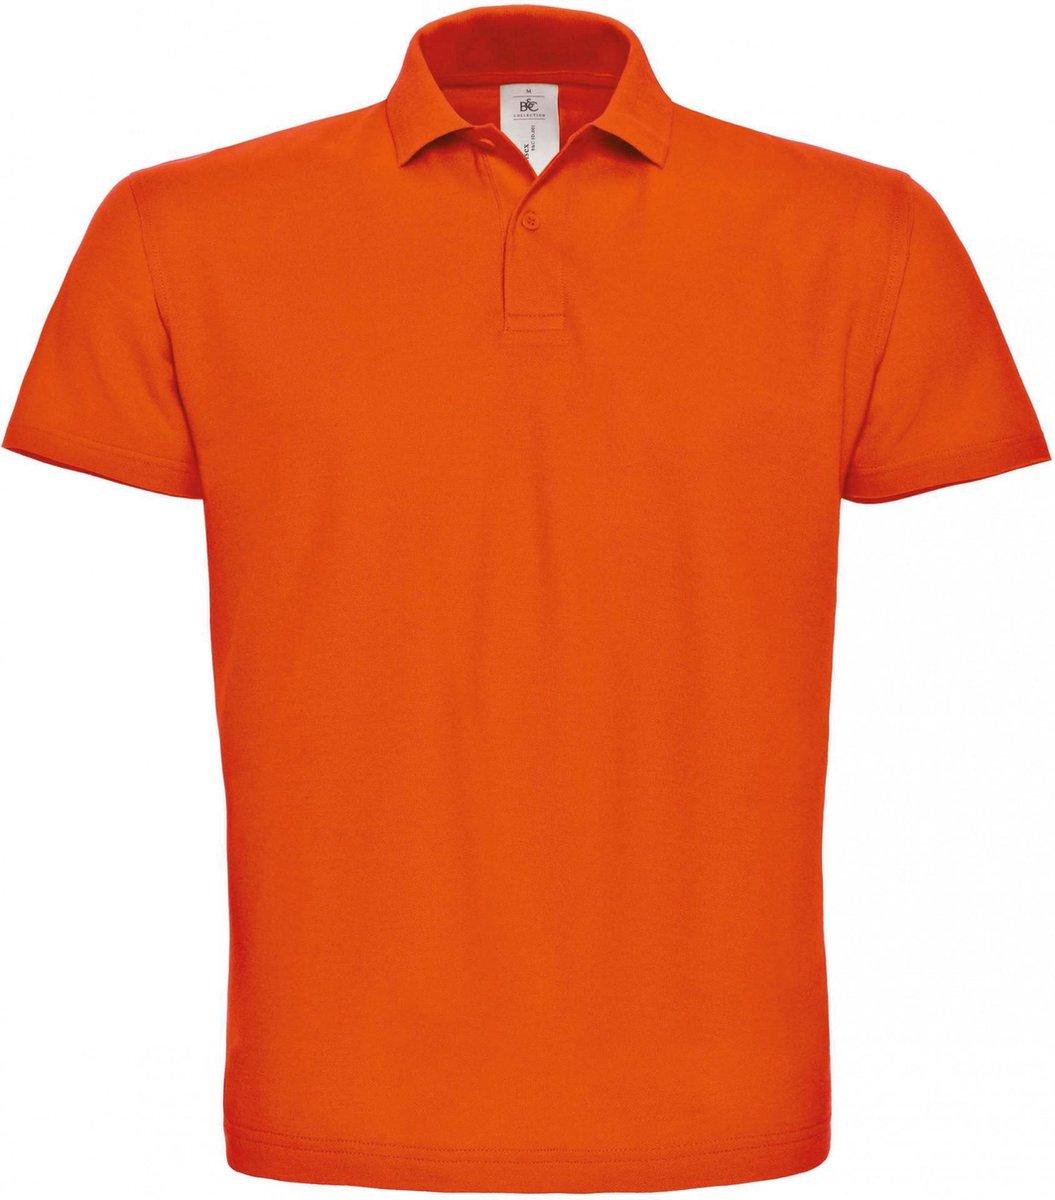 B&C - Heren Oranje Polo - REGULAR FIT - Maat XL - 100 % Katoen